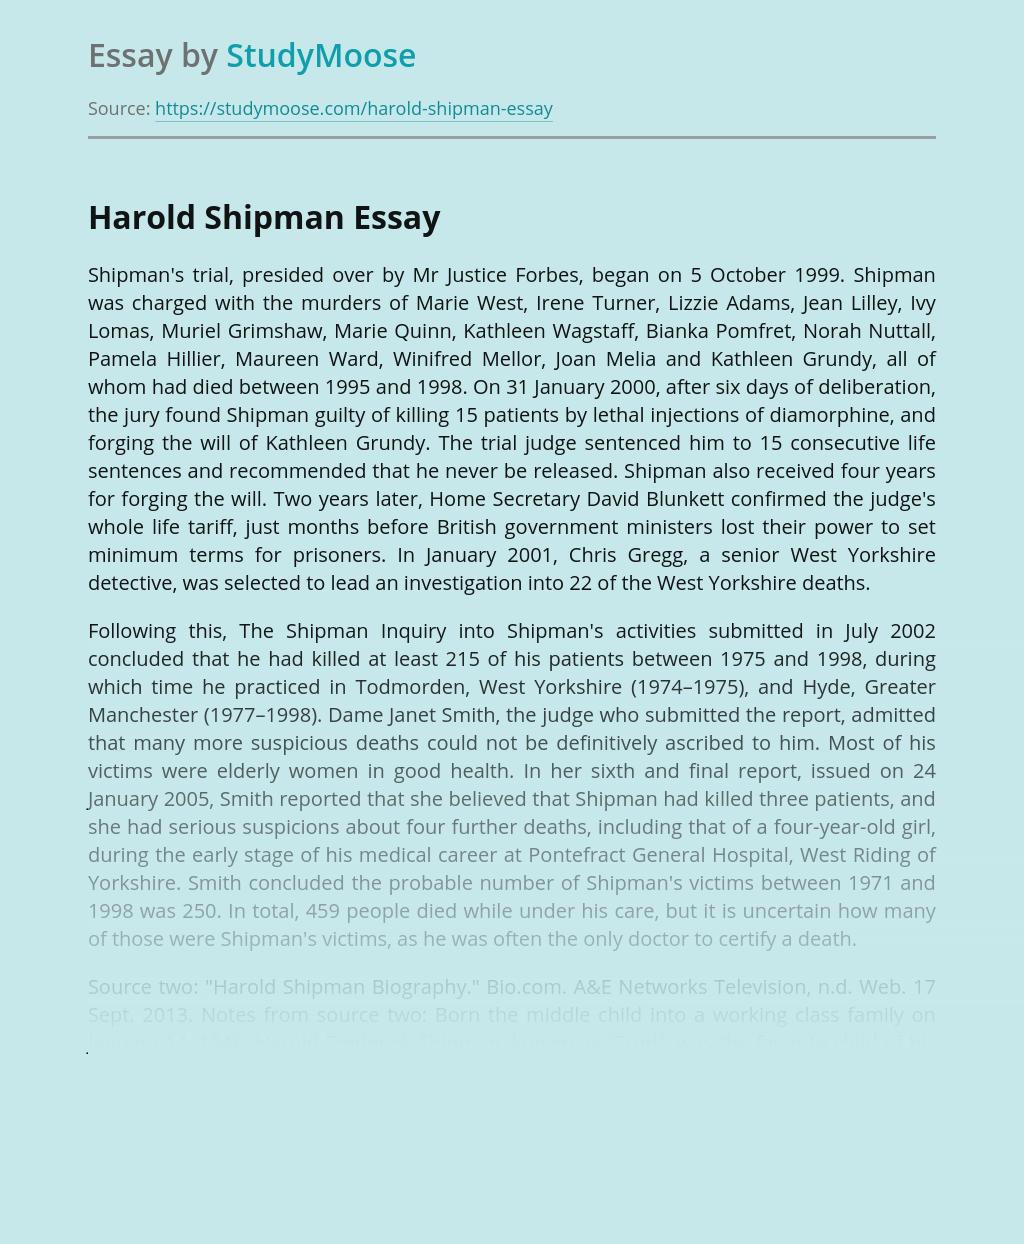 Persona of Harold Shipman